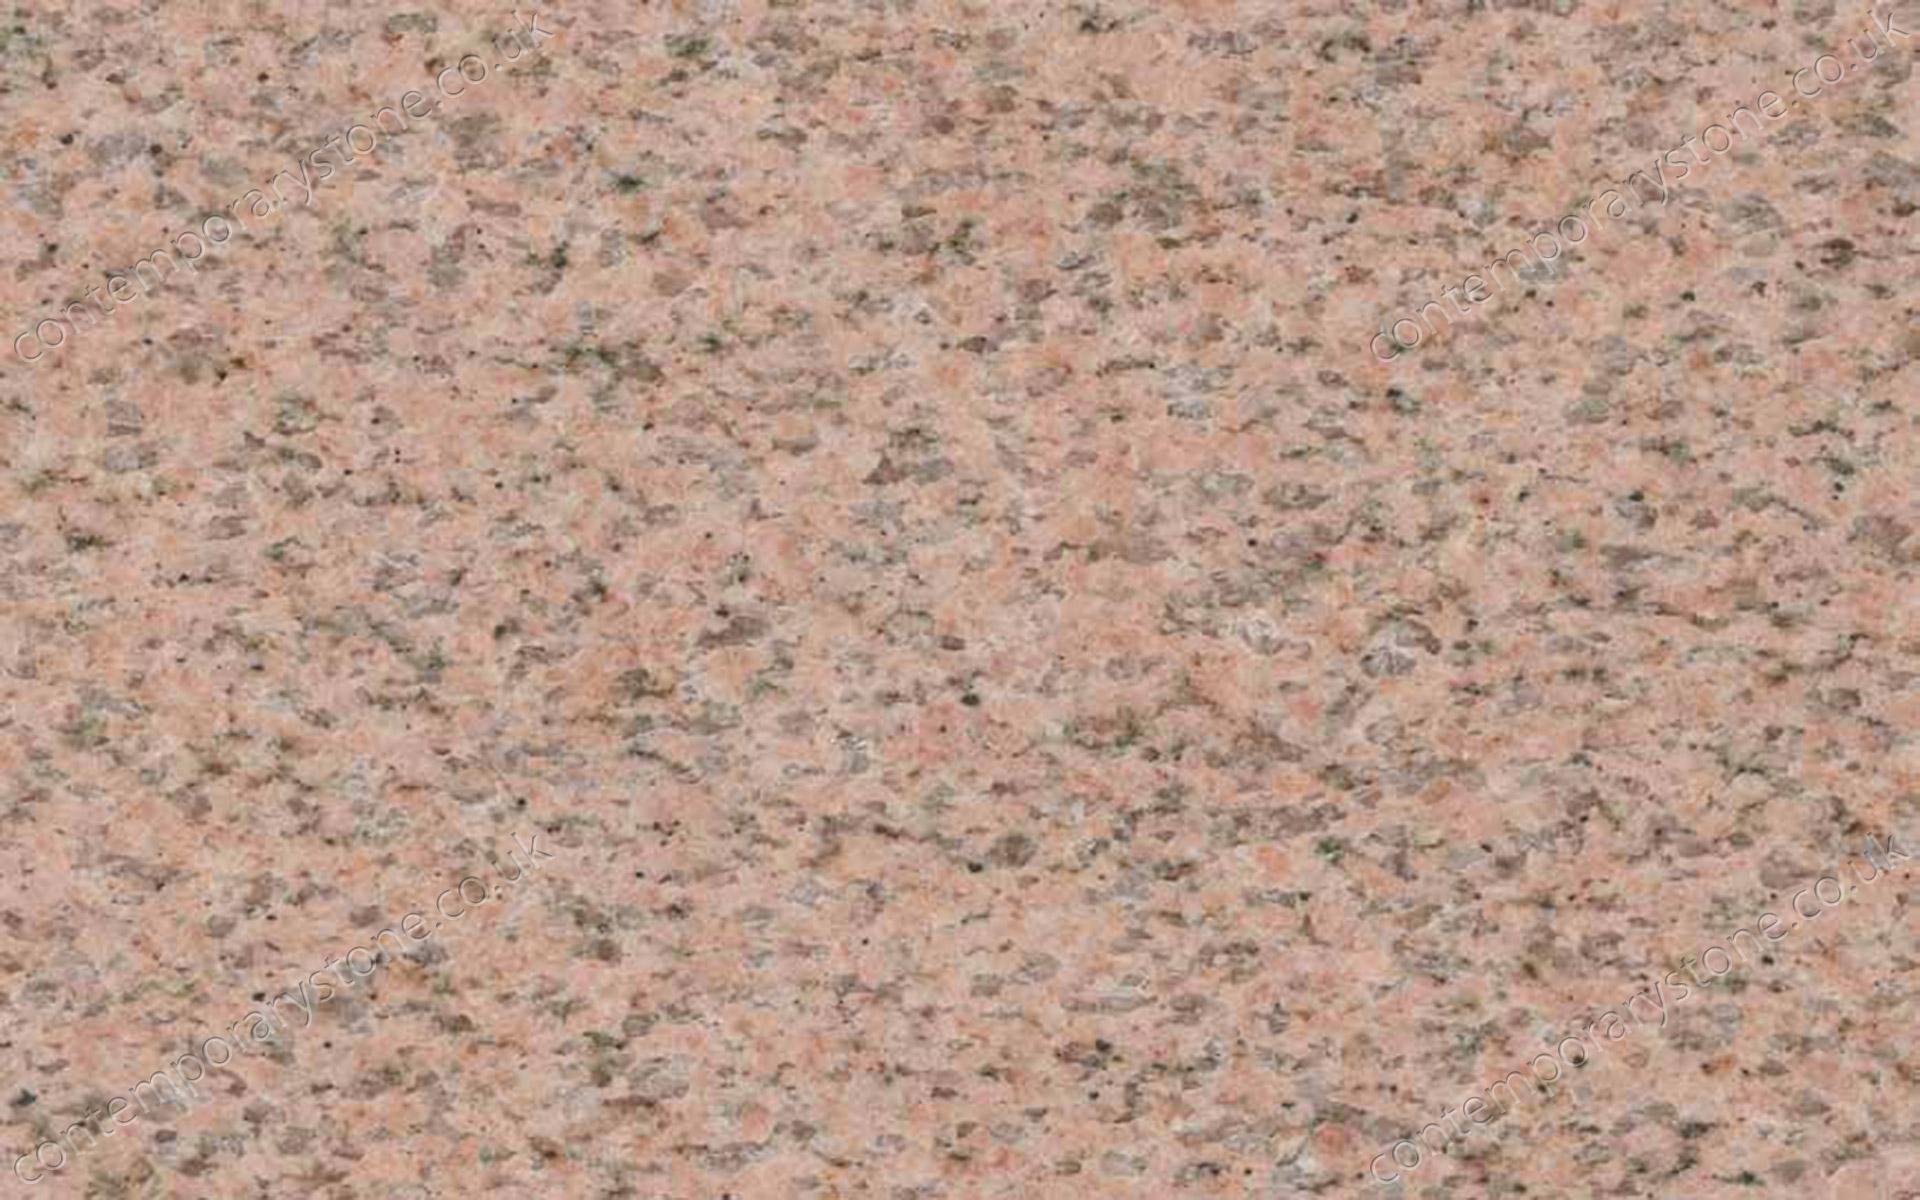 Salisbury Pink granite close-up